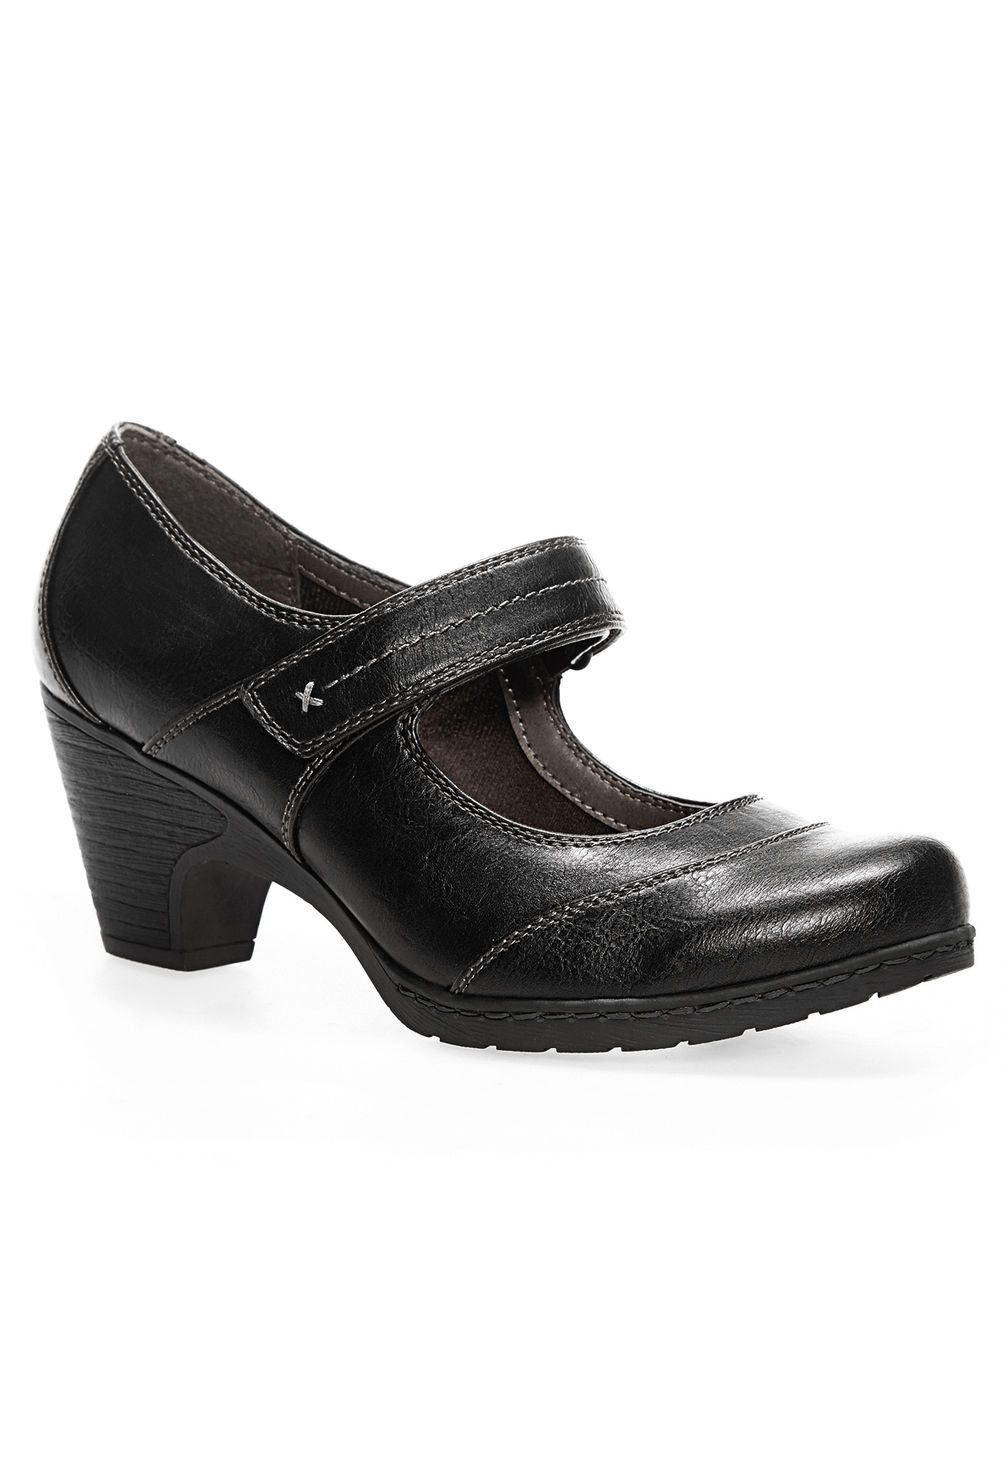 a0d2681e29f Florham Cloudwalkers® Comfort Mary Jane-Wide Width Shoe-Avenue ...